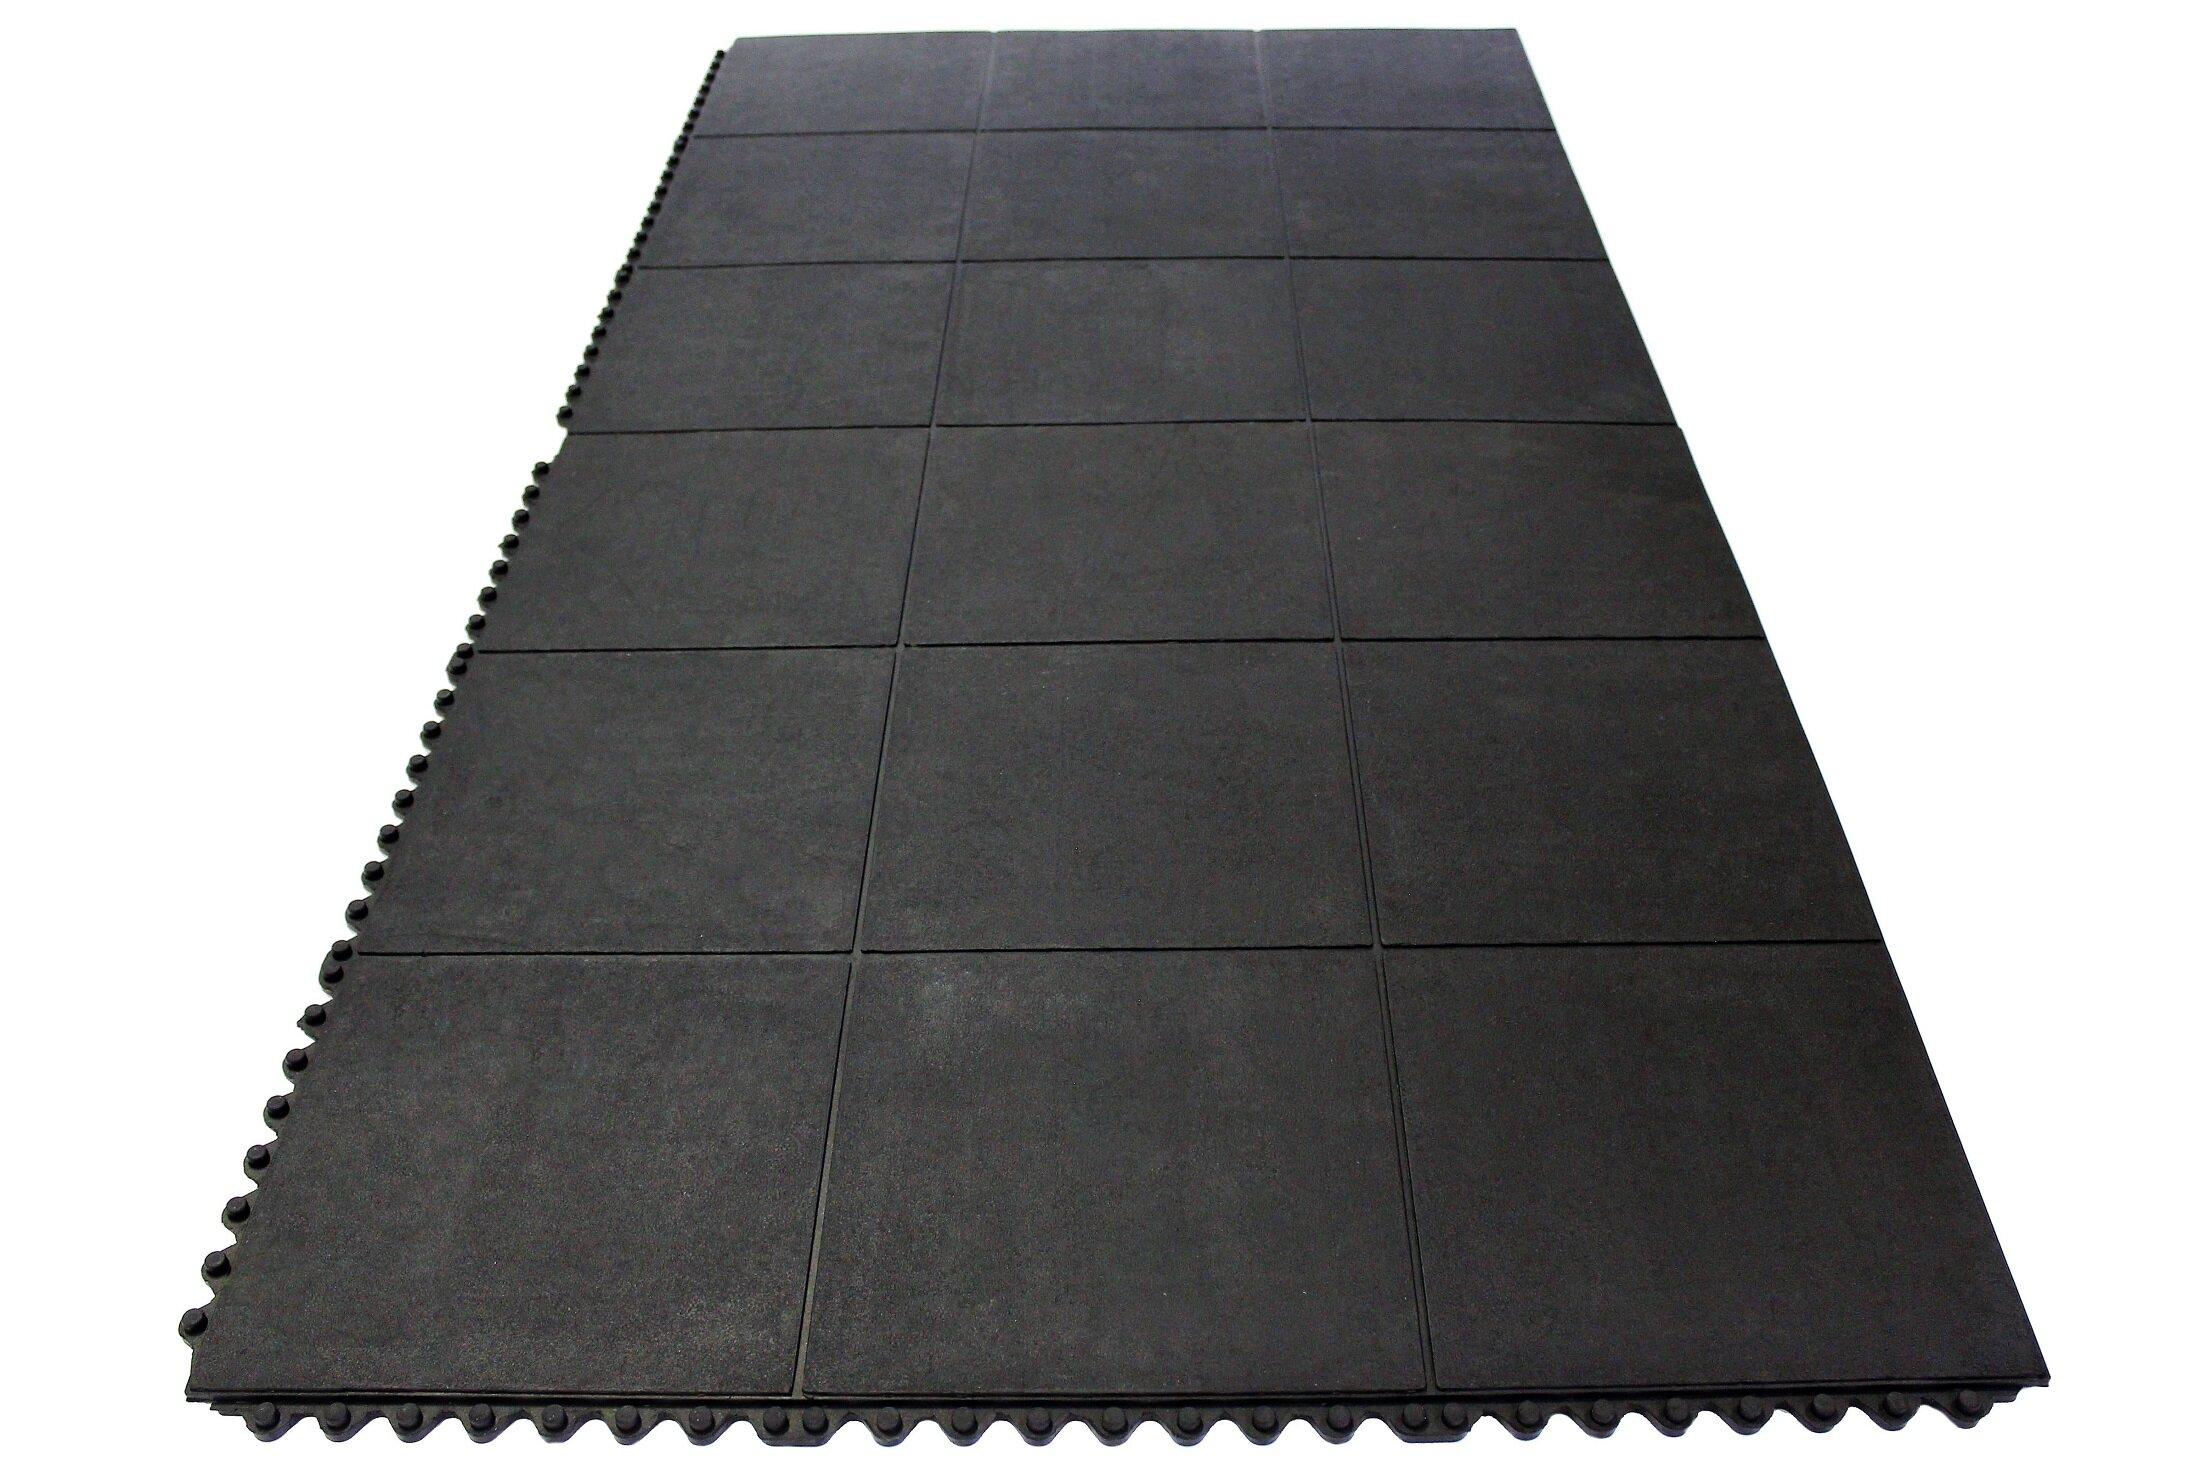 Envelor Home Heavy Duty Solid Rubber Garage Flooring Tiles In Black - Padded garage floor mats